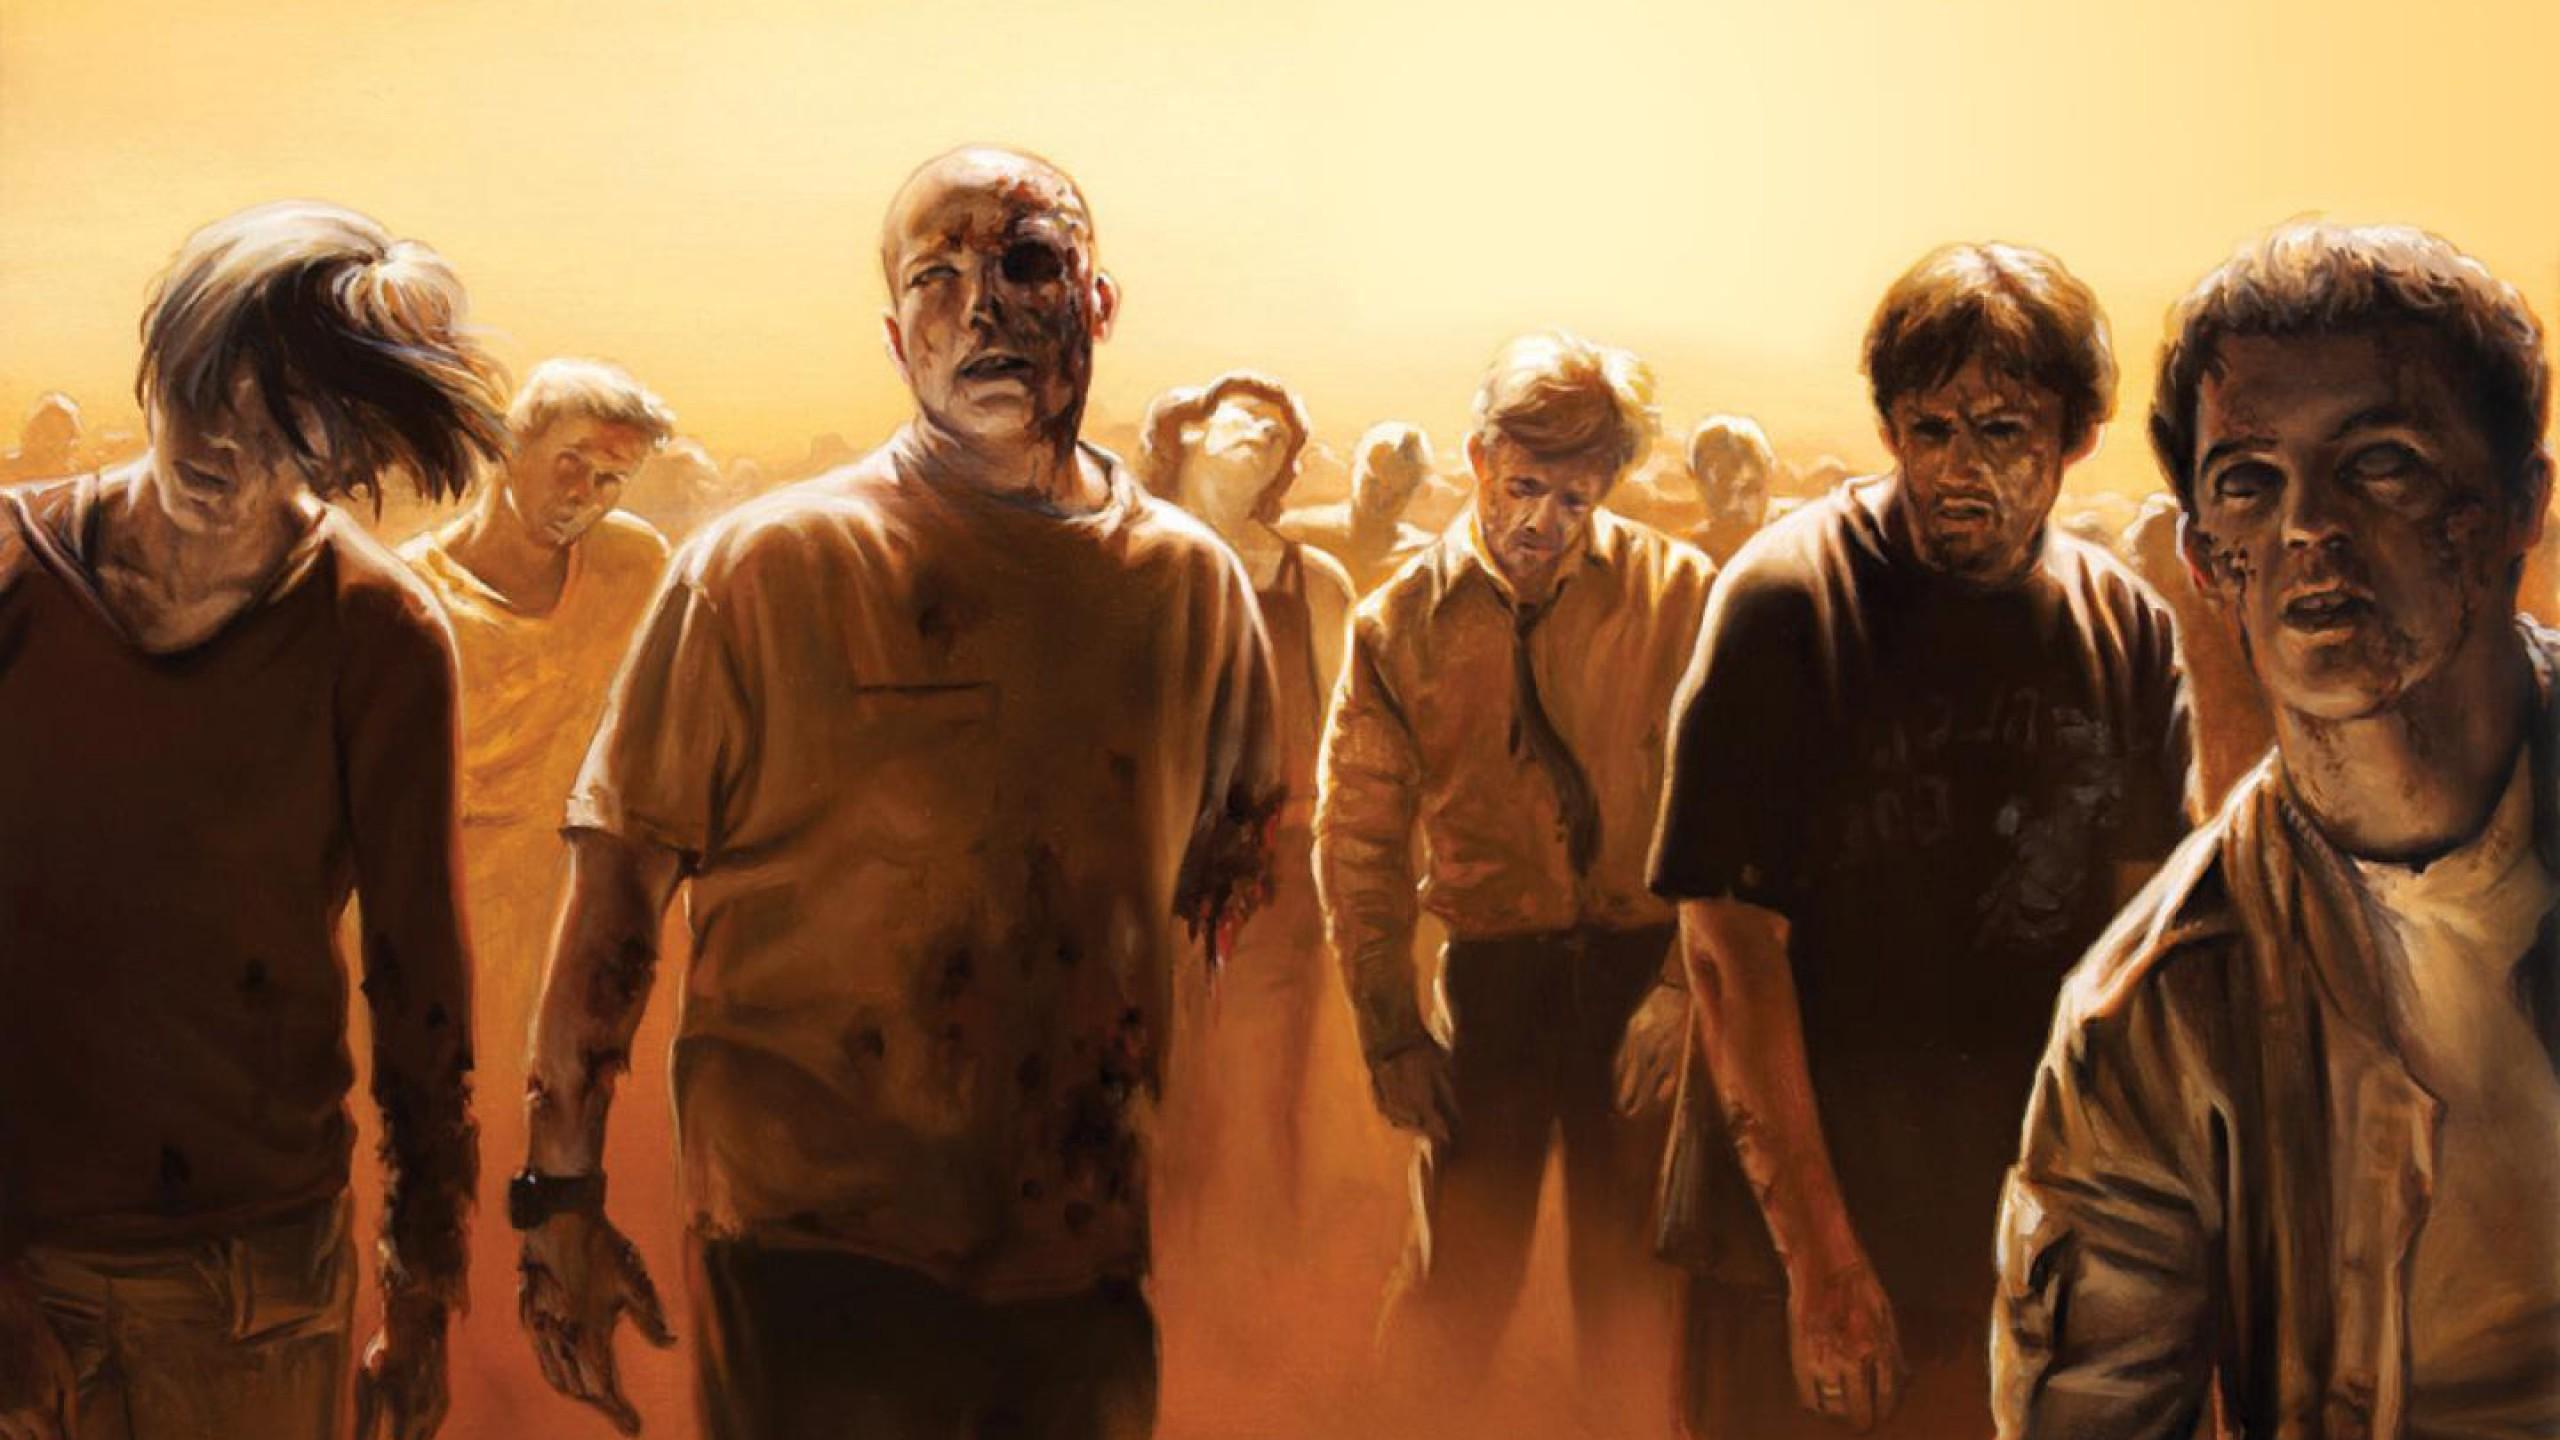 1 Miscellaneous Digital Art Zombies Zombie Crowd Wallpaper Zombie Hd Wallpapers 1080p 2560x1440 Download Hd Wallpaper Wallpapertip